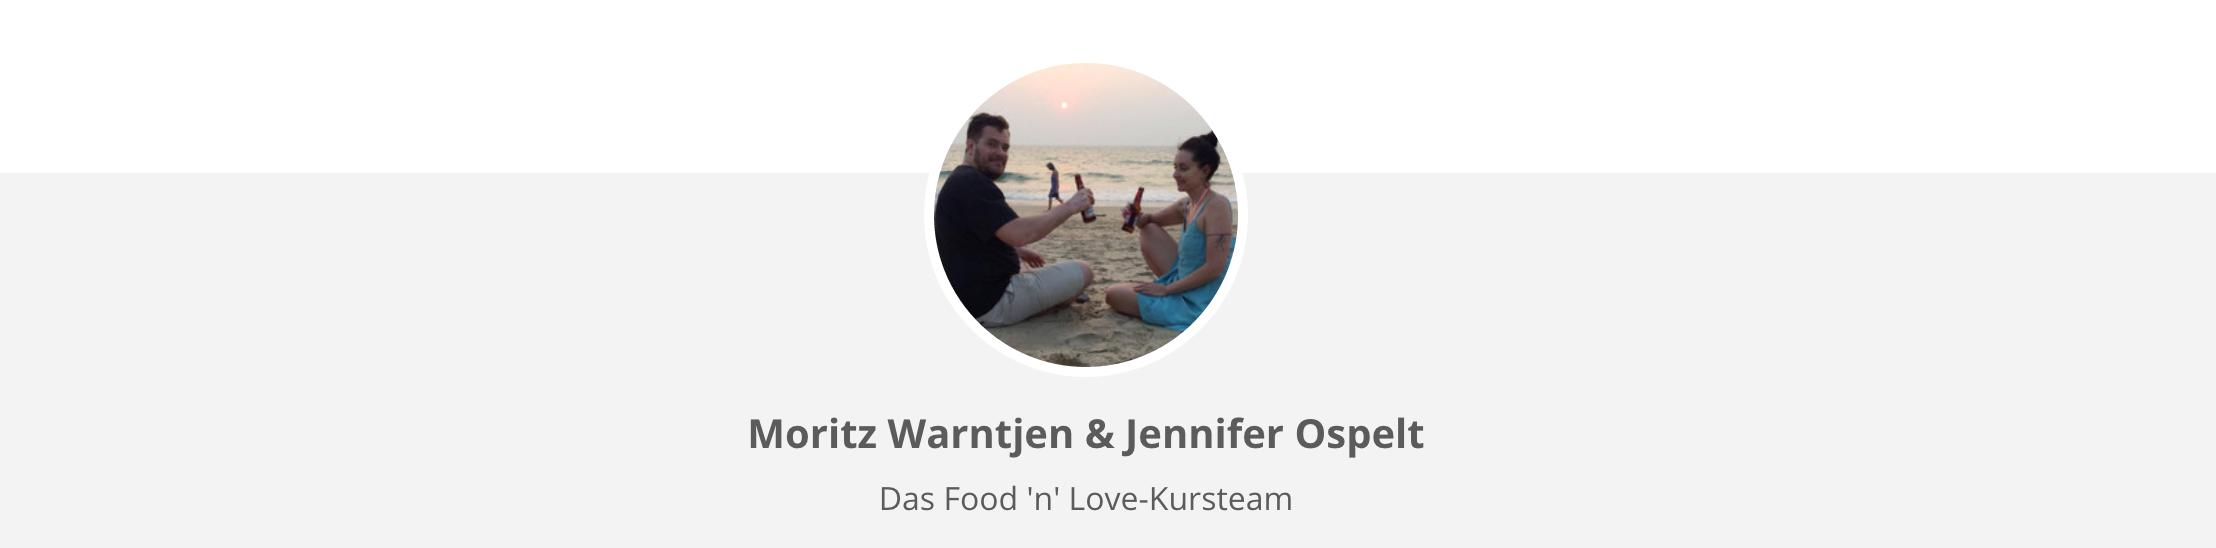 Food 'n' Love Onlinekursteam Moritz & Jenny